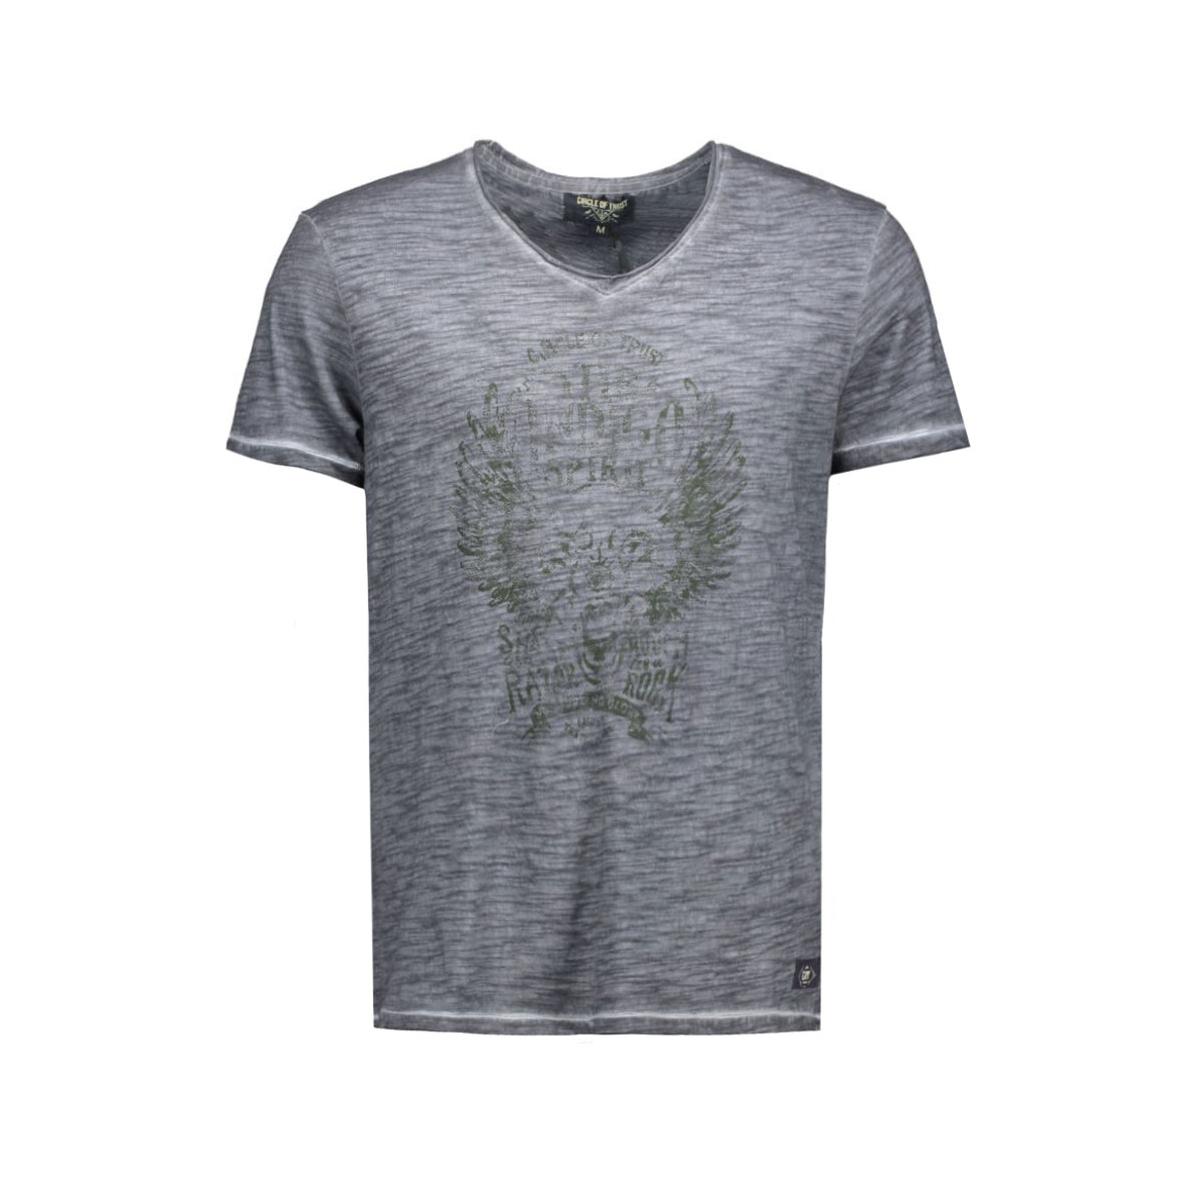 hw16.26.2544 circle of trust t-shirt dark marine